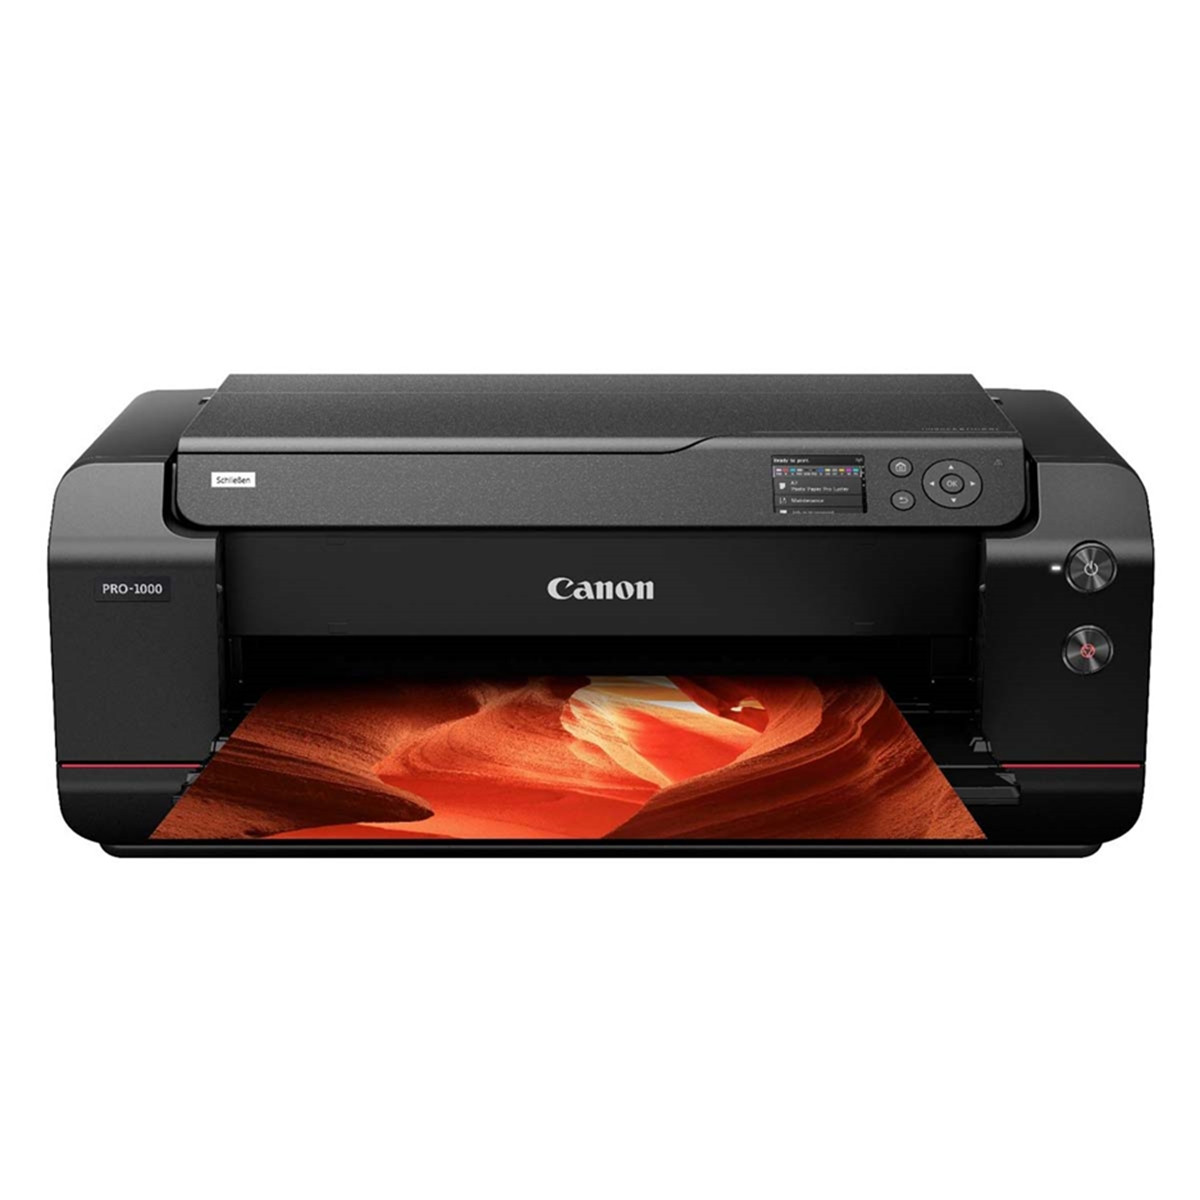 "Impressora Canon imagePROGRAF Pro 1000 0608C027AA   A2 420x594mm (17"")"